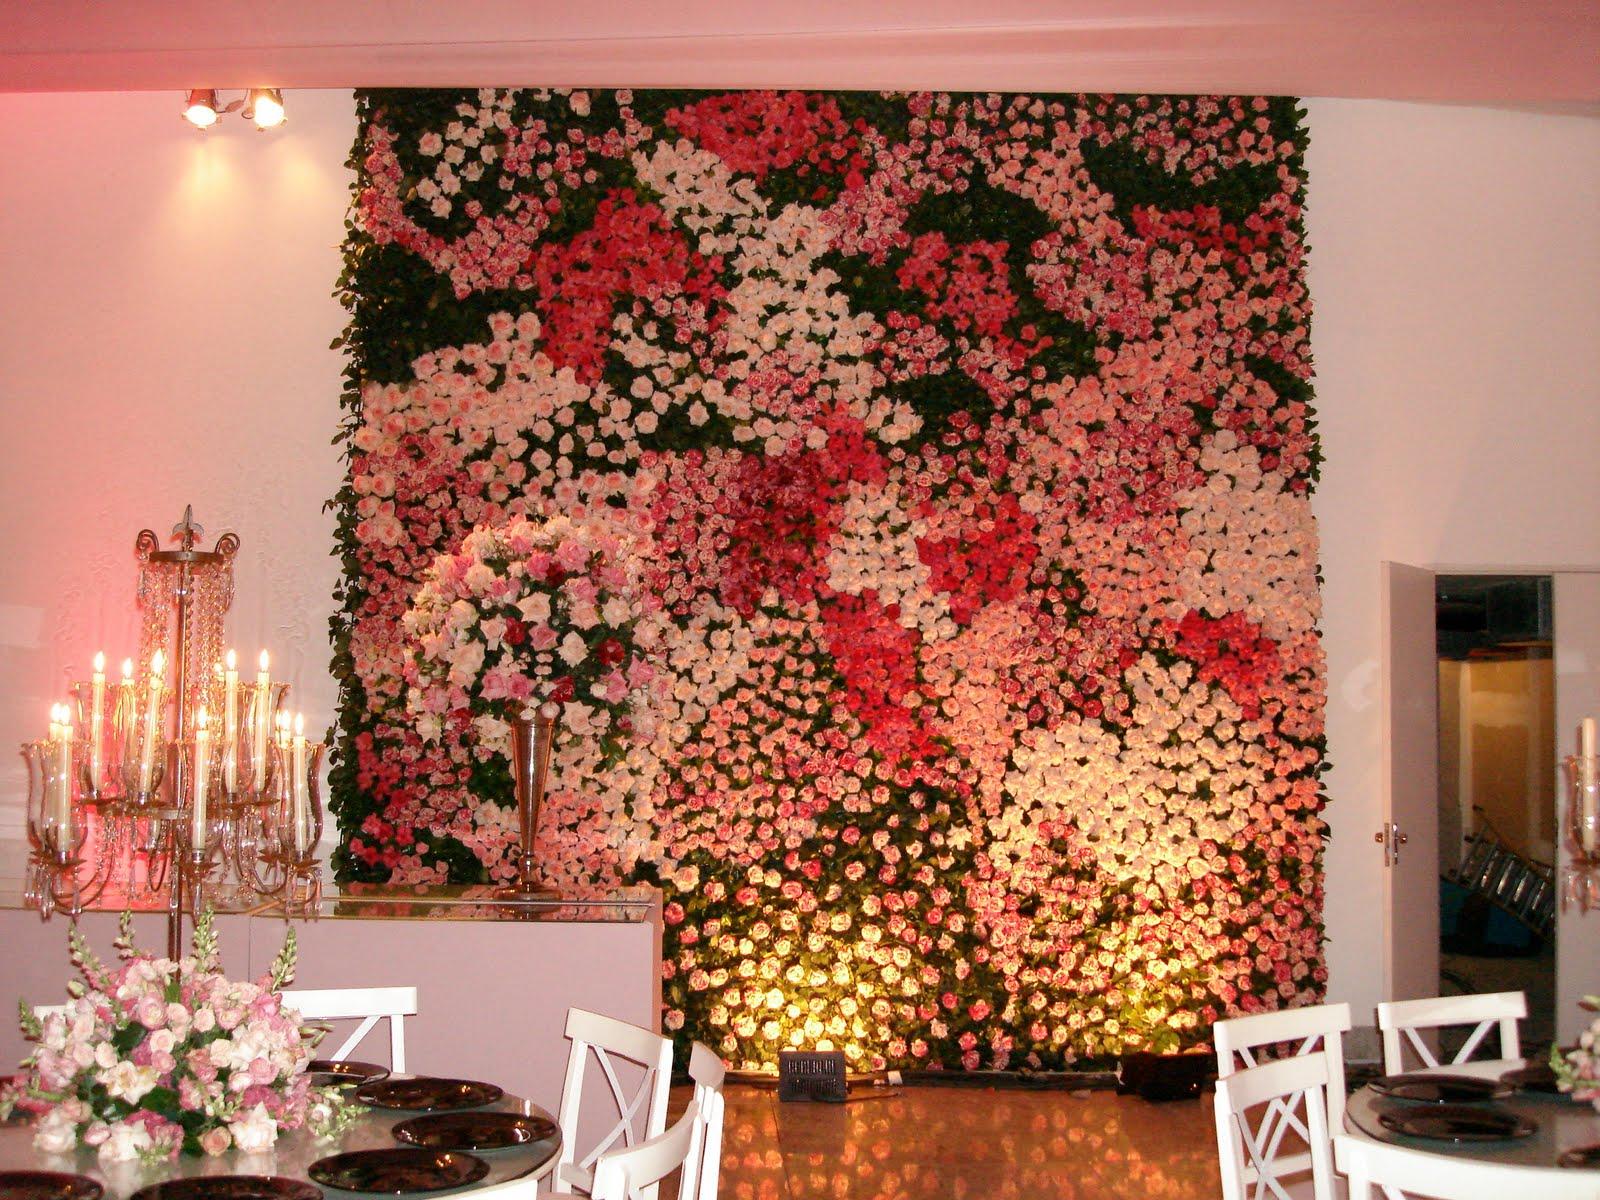 Paredes decoradas natacha lucena natacha lucena for Paredes moradas decoradas